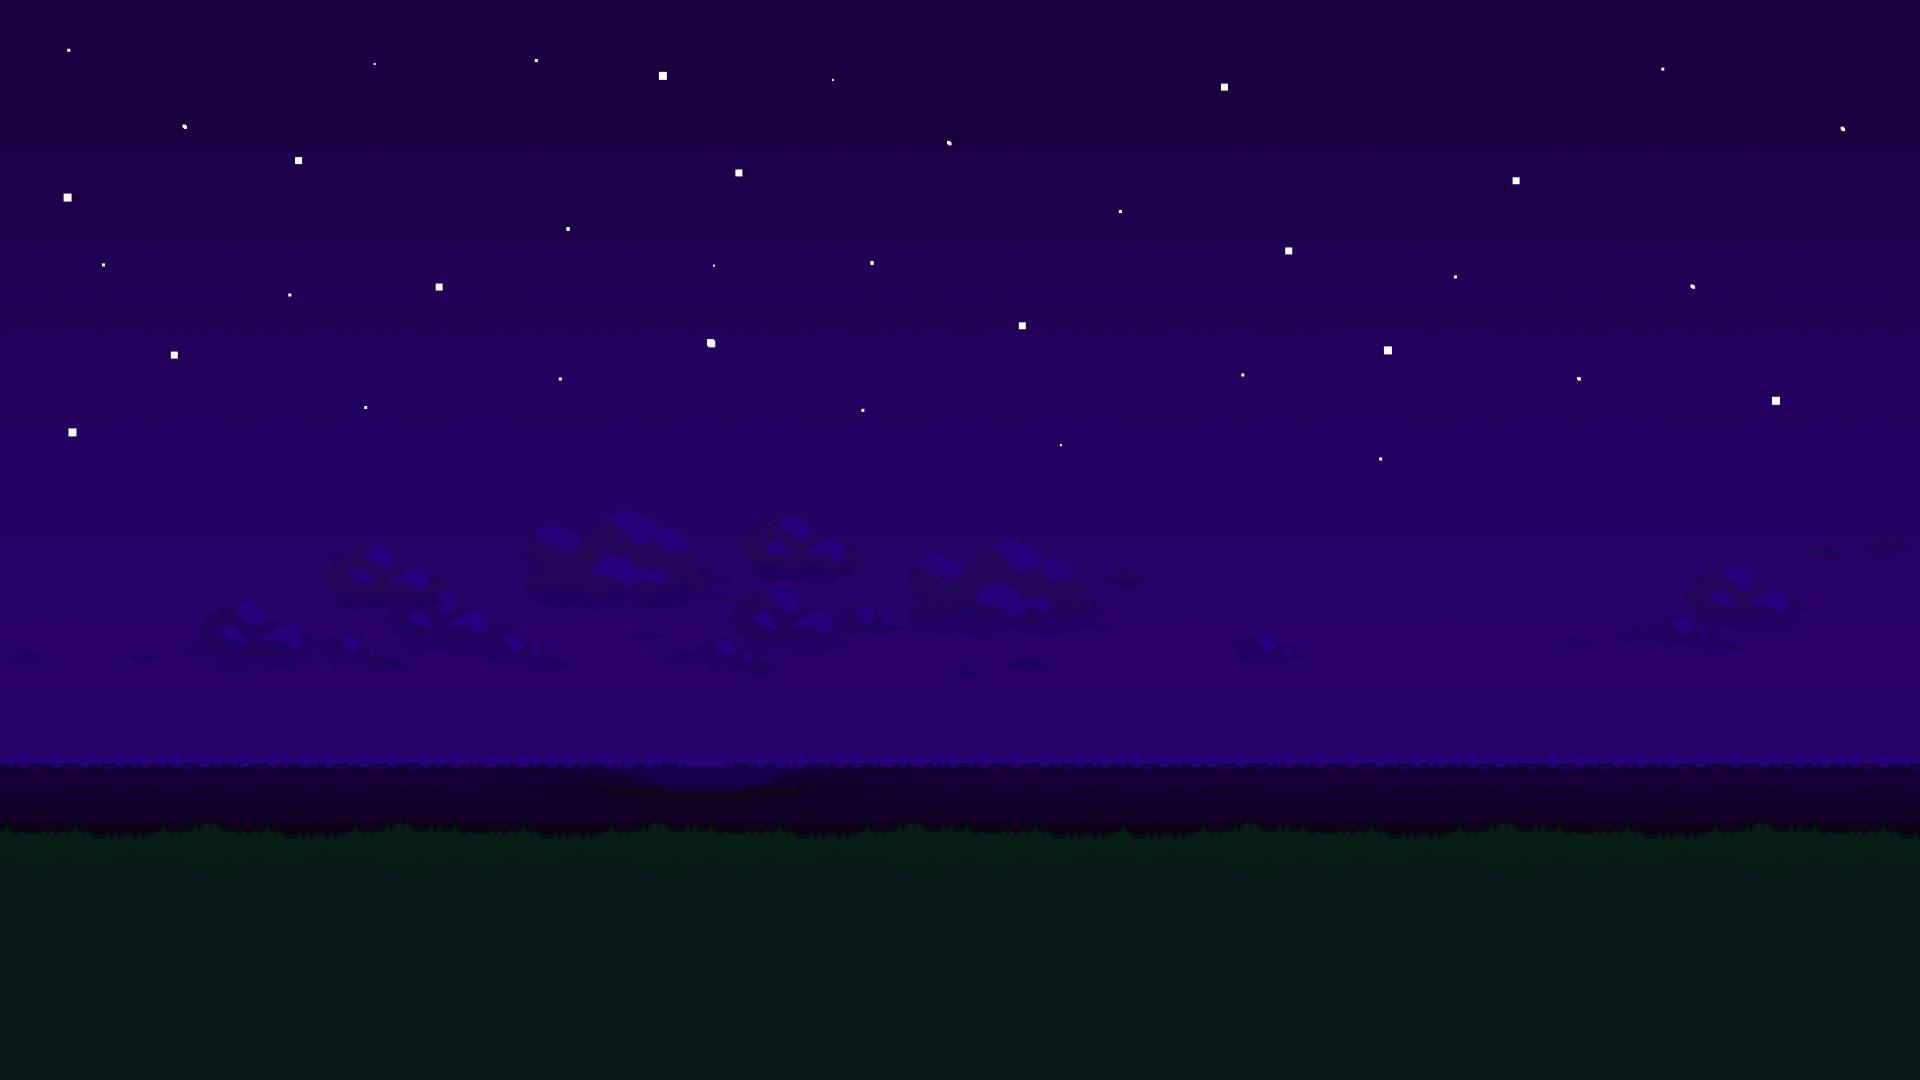 Pixel Landscape background Tumblr ·① Download free full HD ...